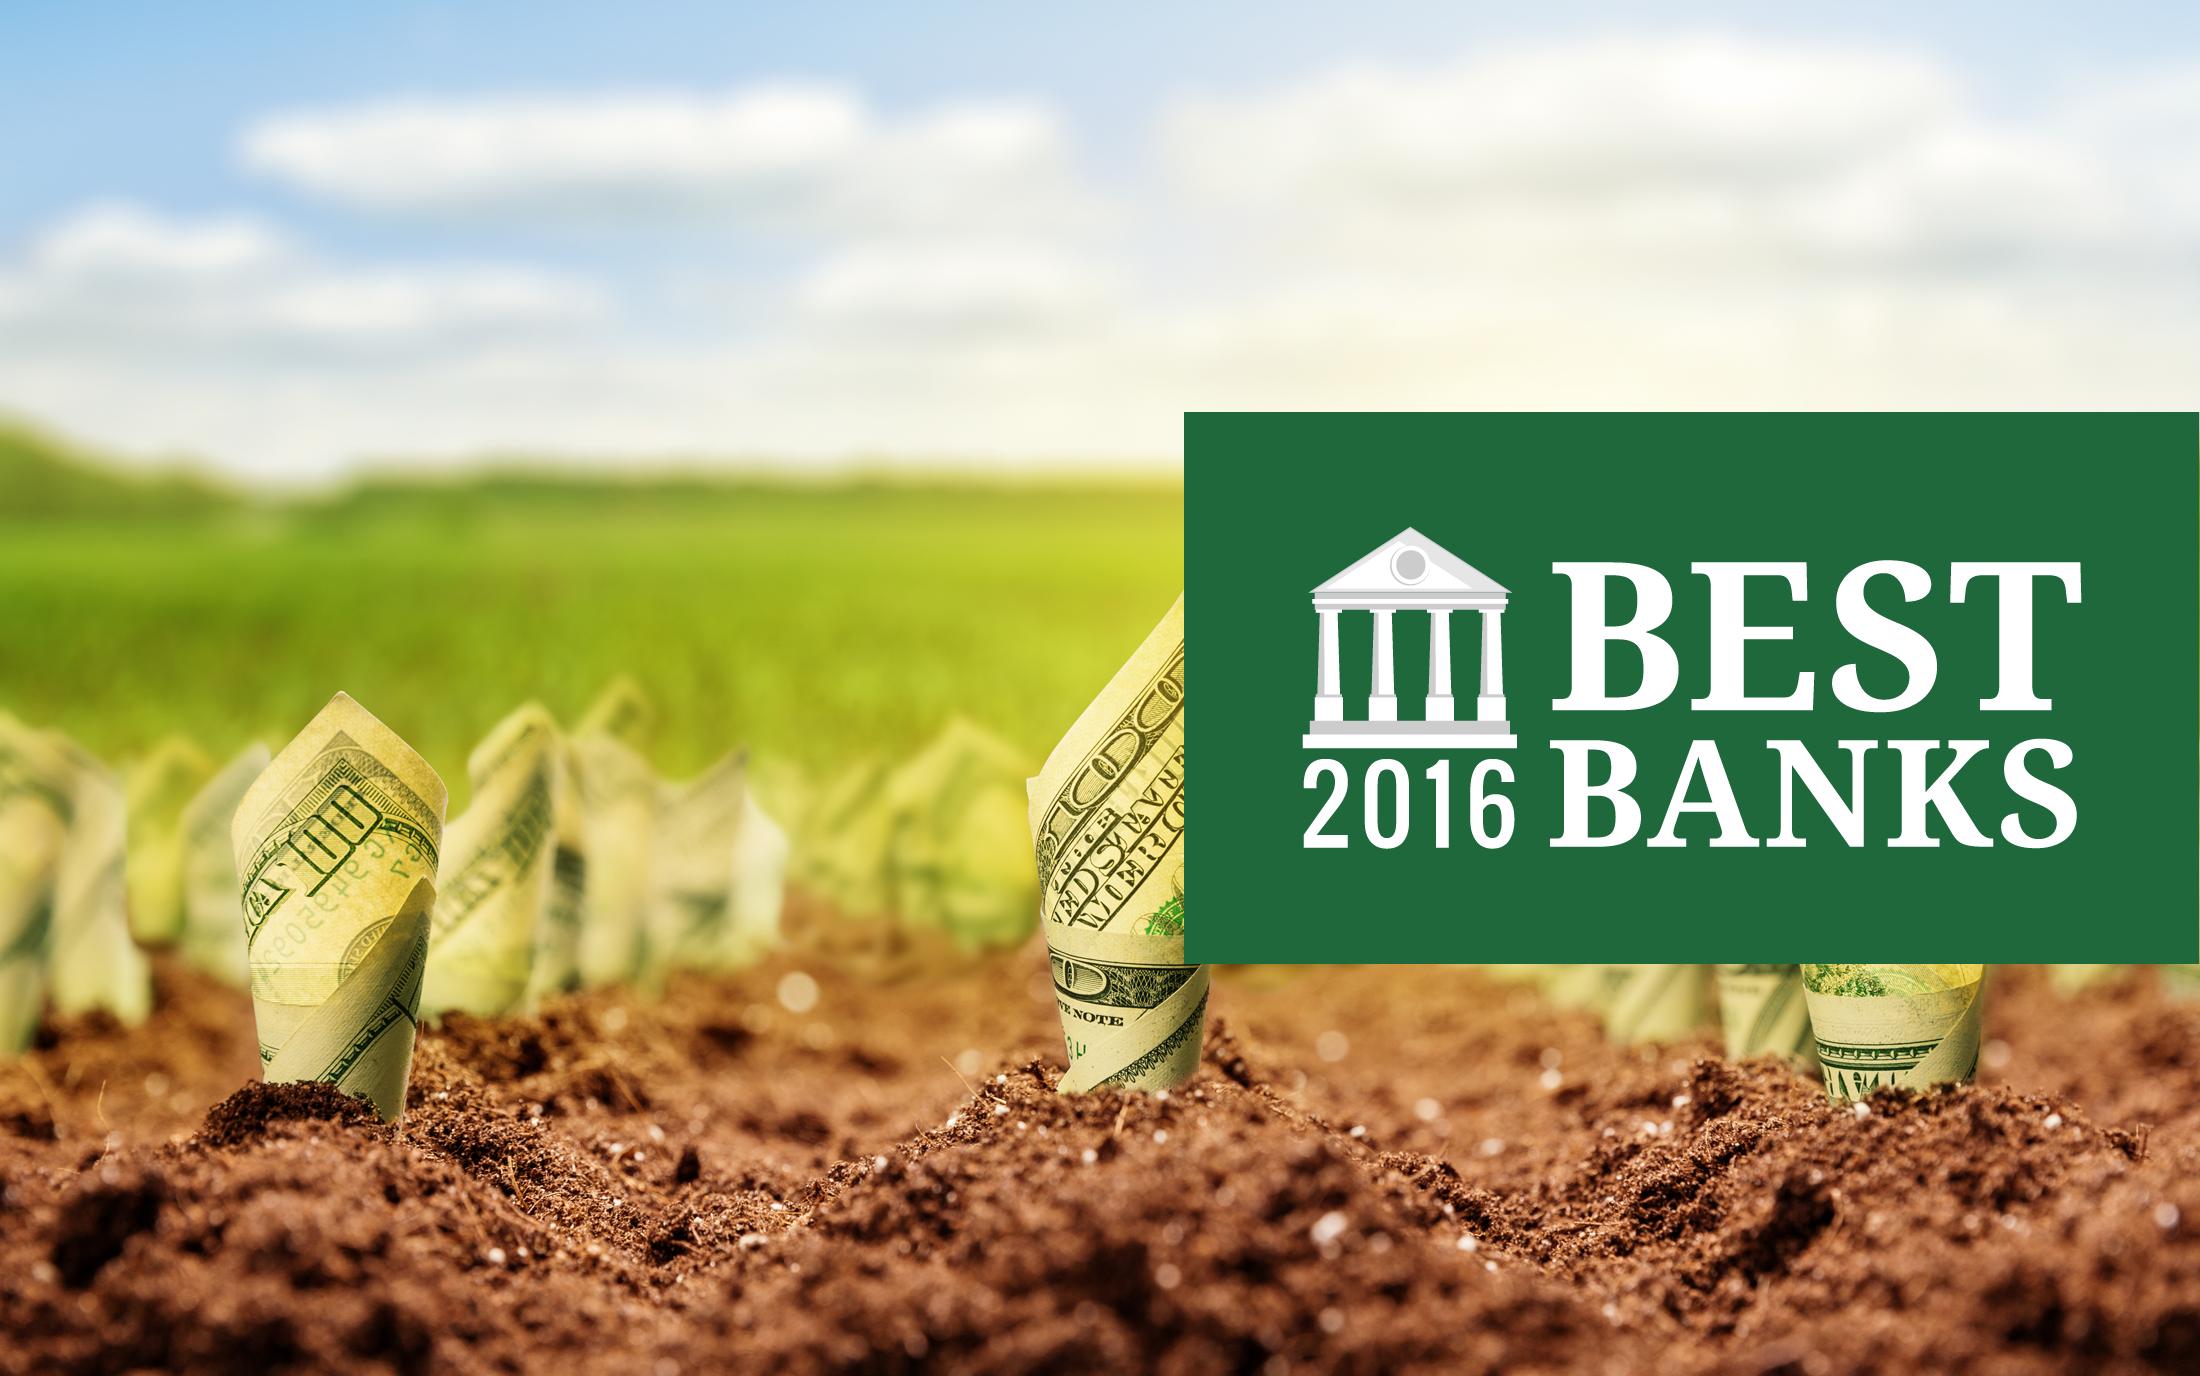 Online Banks Cd Rates Gbr Bestbanks Rankingarticles Cd V